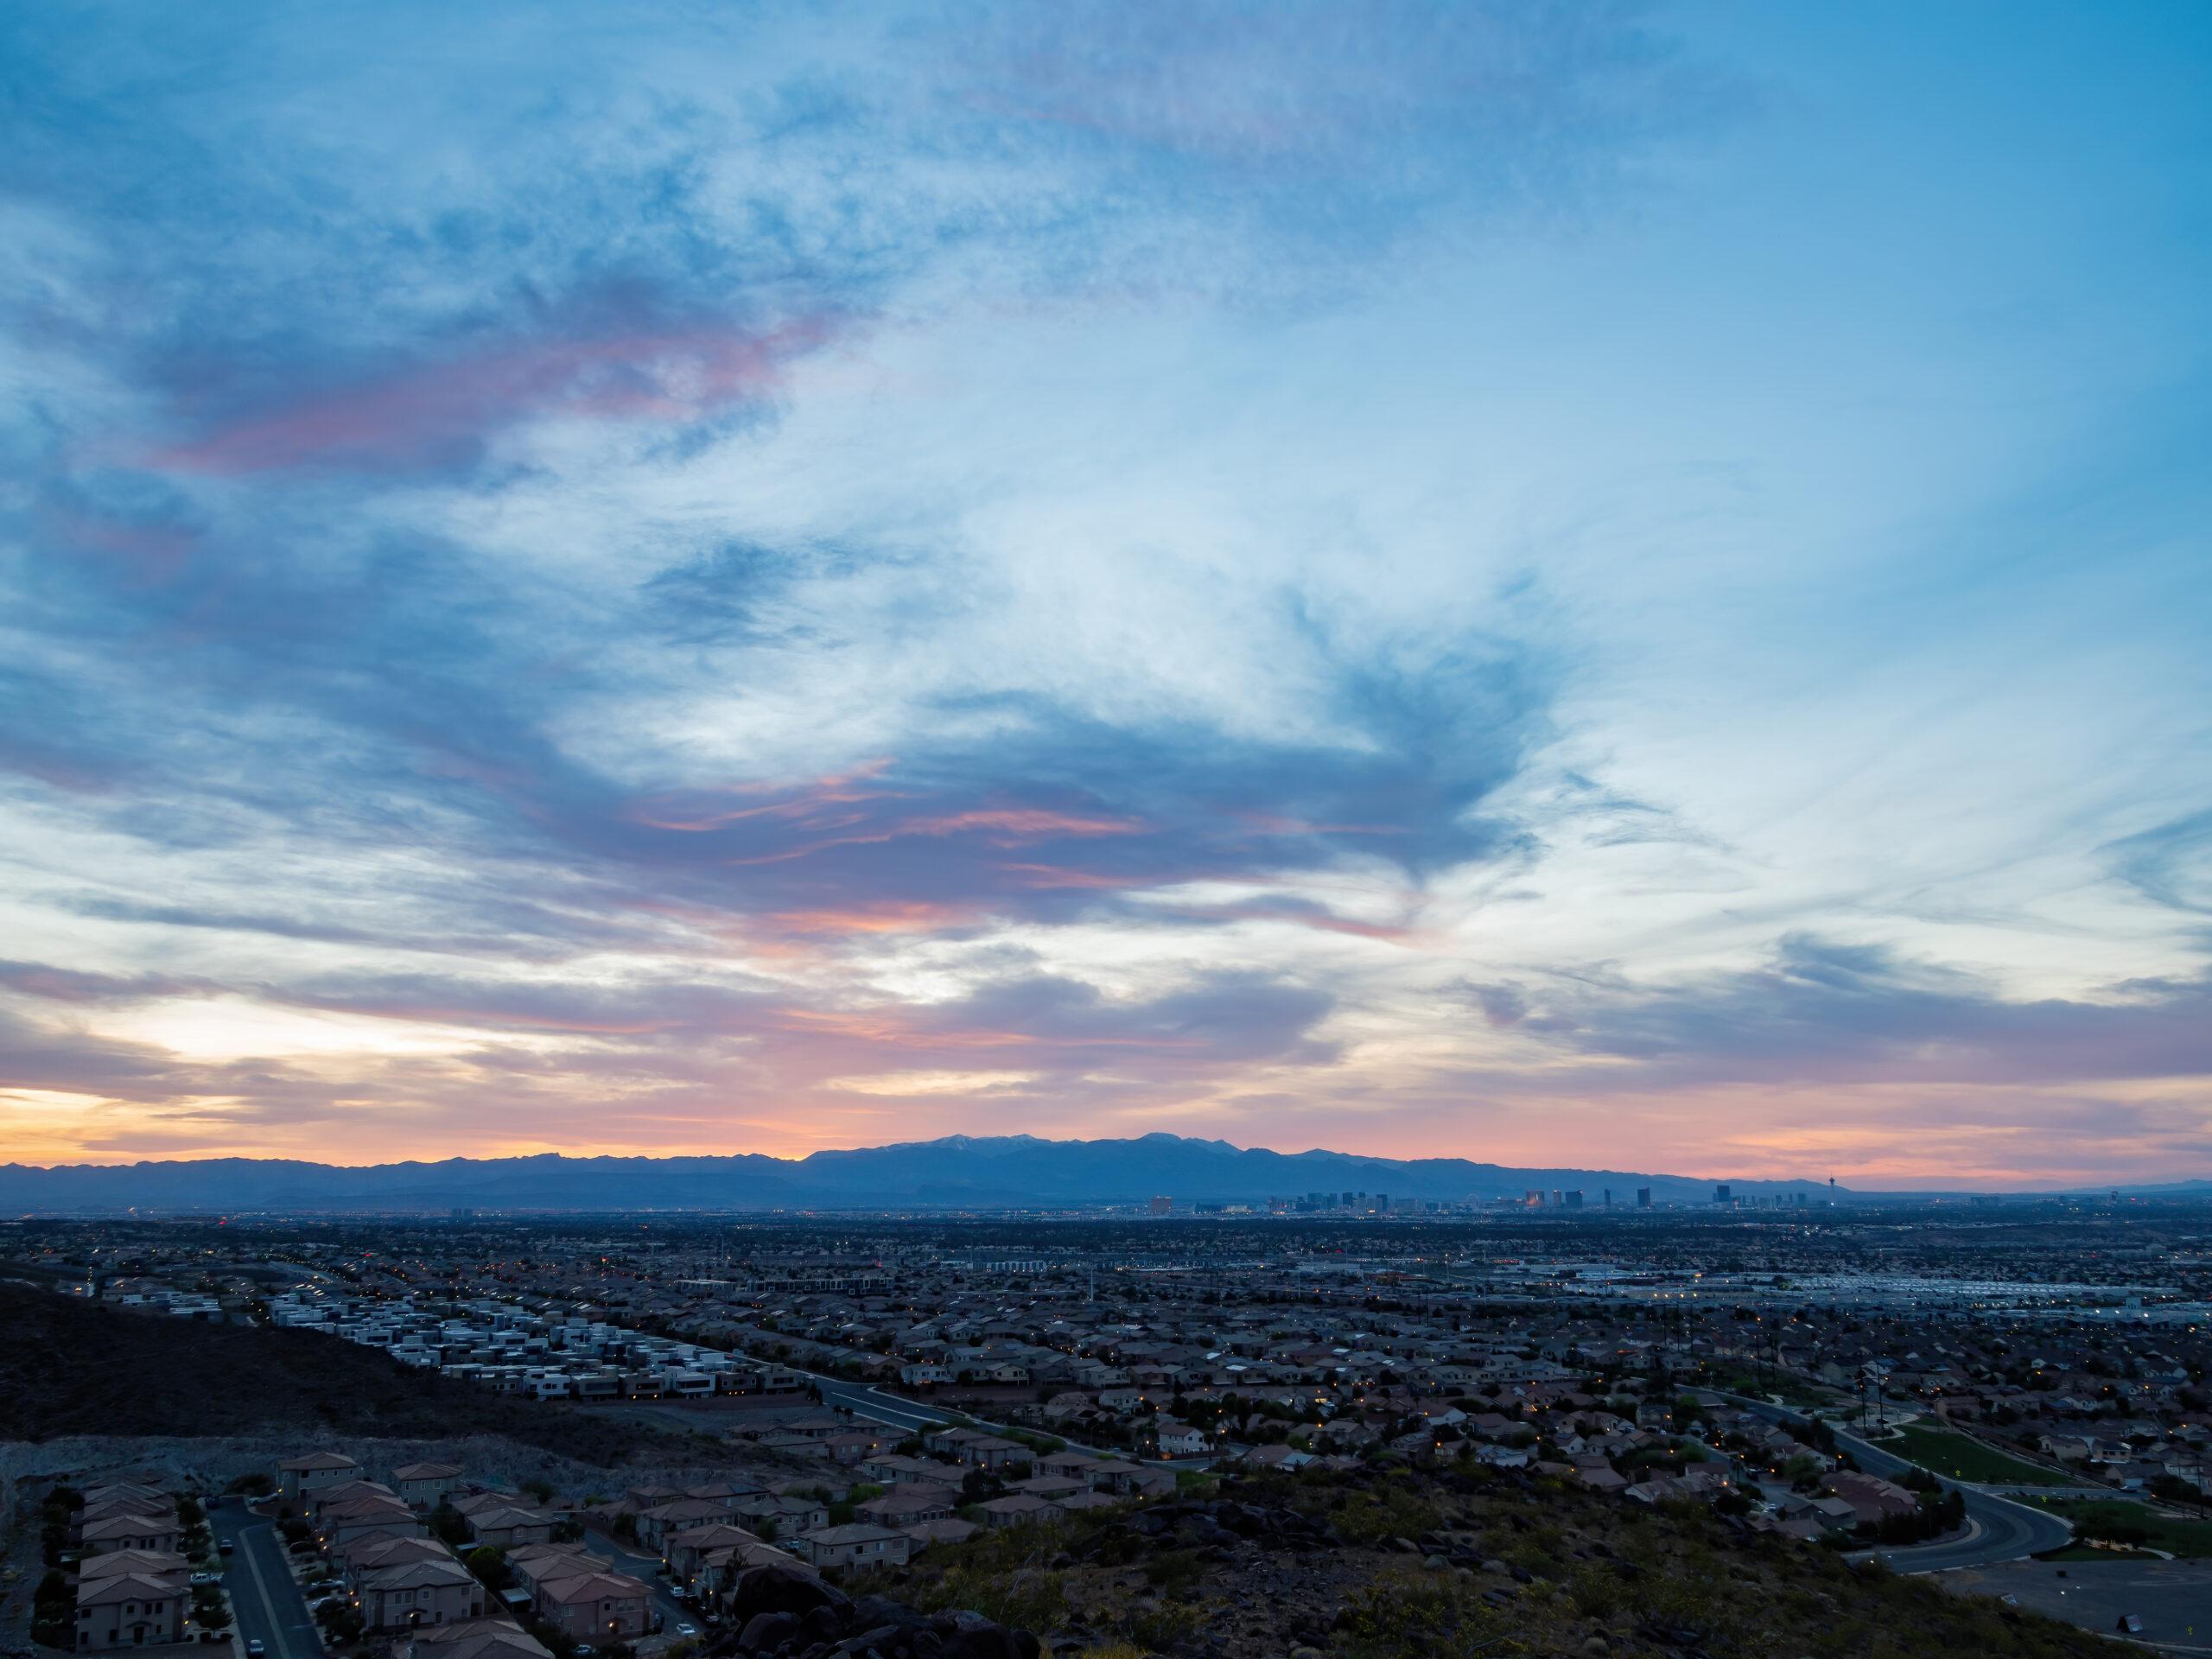 St. Rose Corridor - Henderson, Nevada Market Reports image